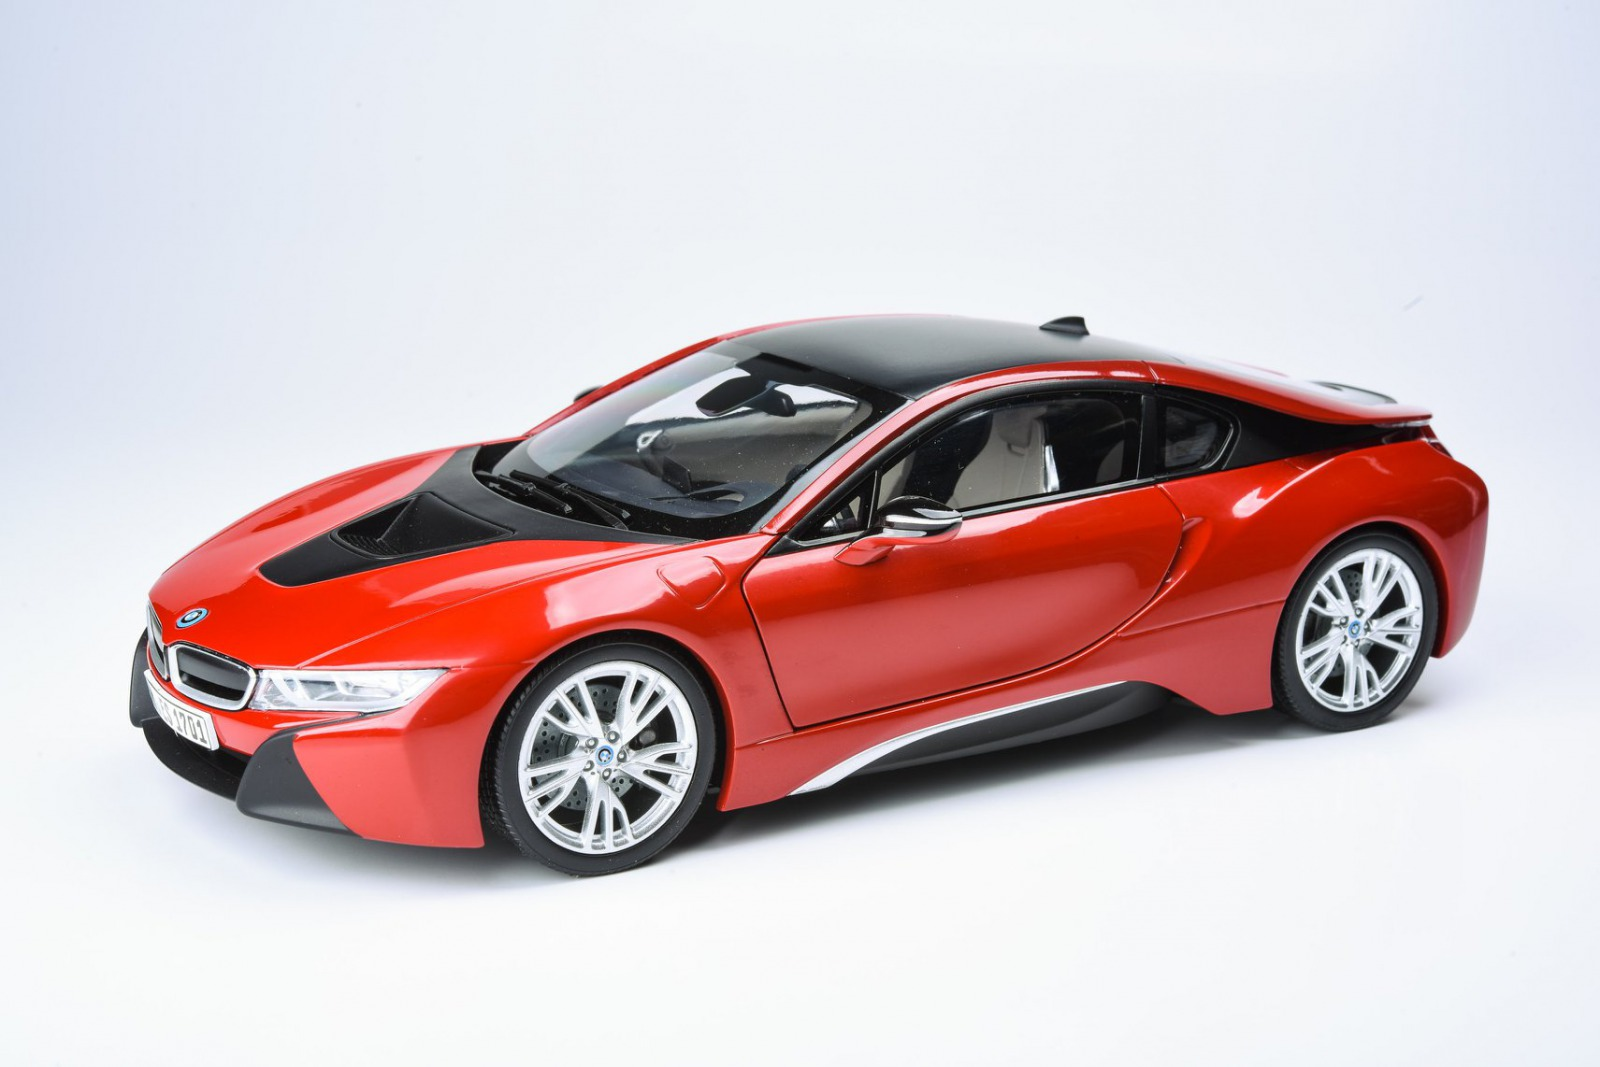 Paragon Models パラゴンモデル 1/18 ミニカー ダイキャストモデル 2017年モデル BMW i82017 BMW i8 1:18 Paragon Models